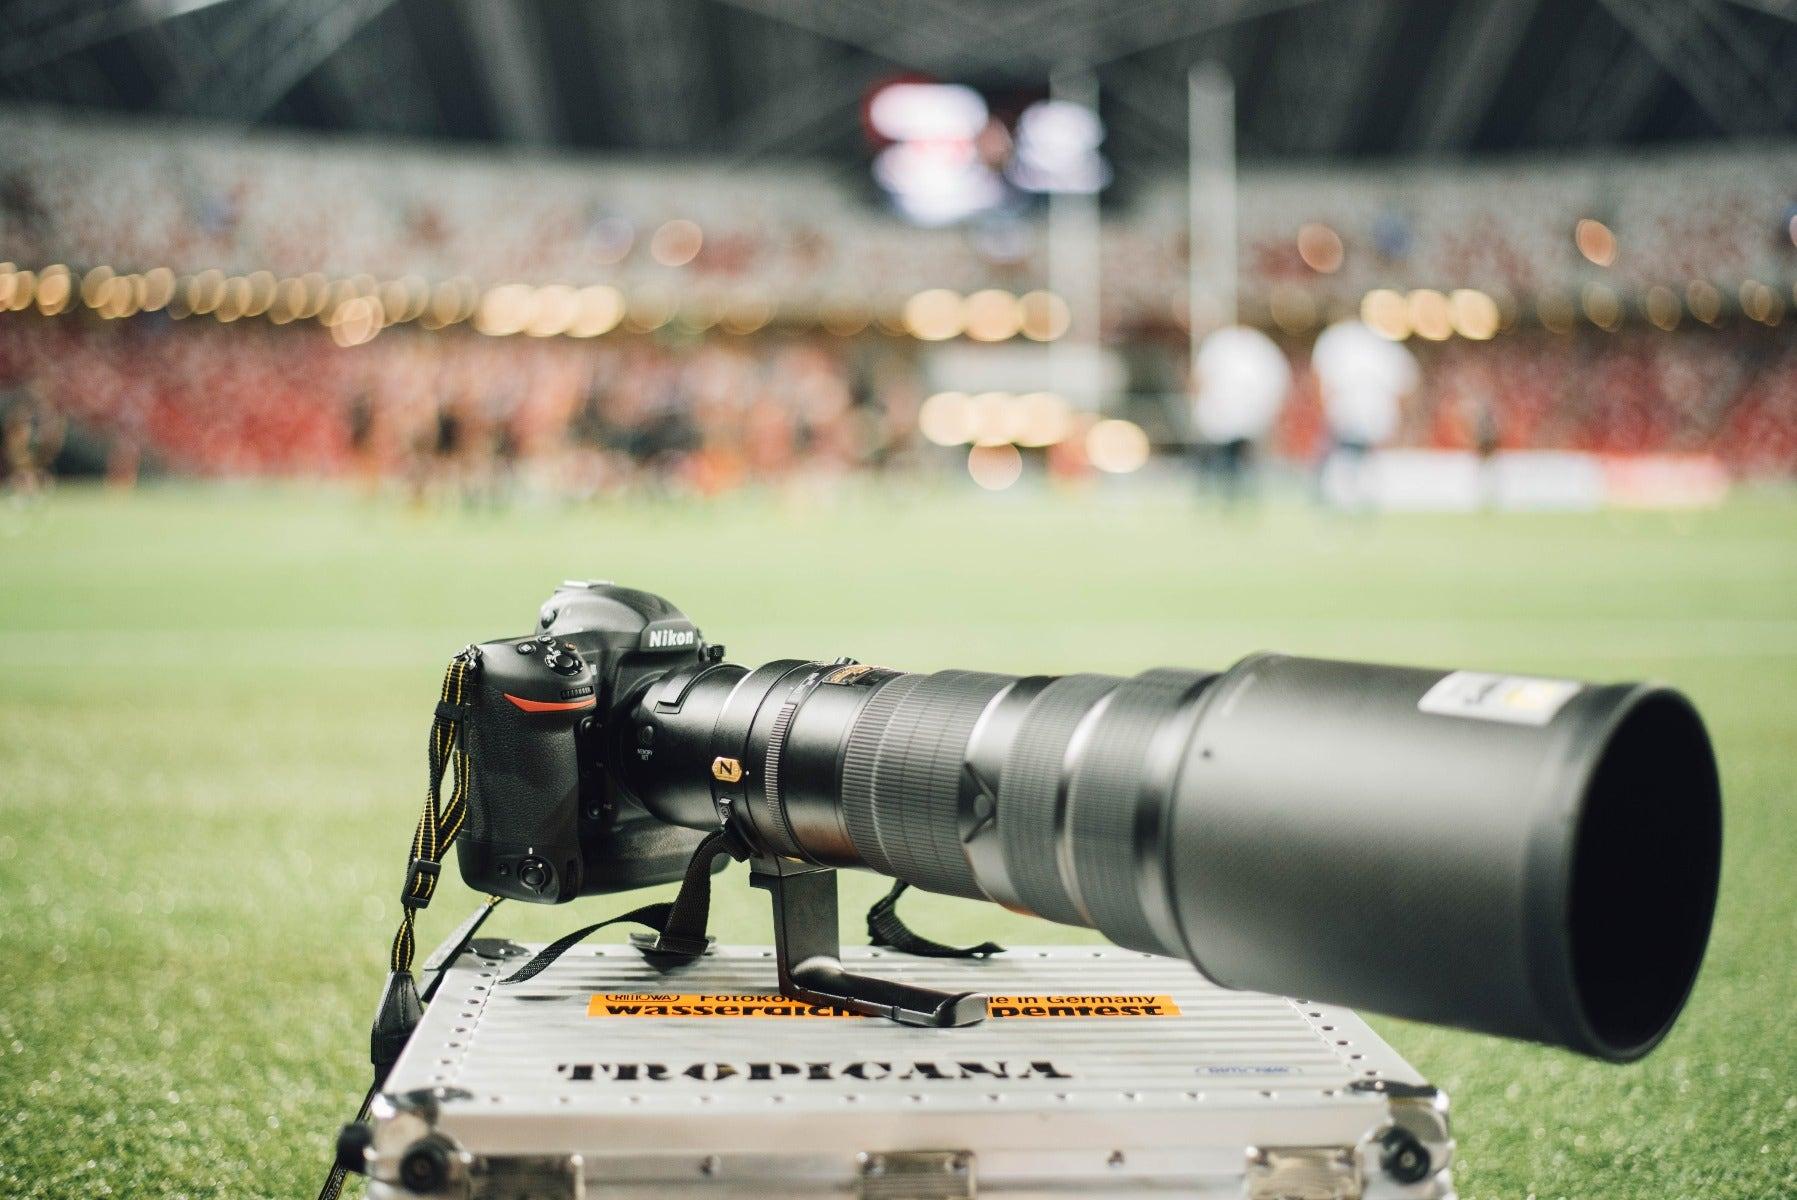 Nikon camera with telephoto lens